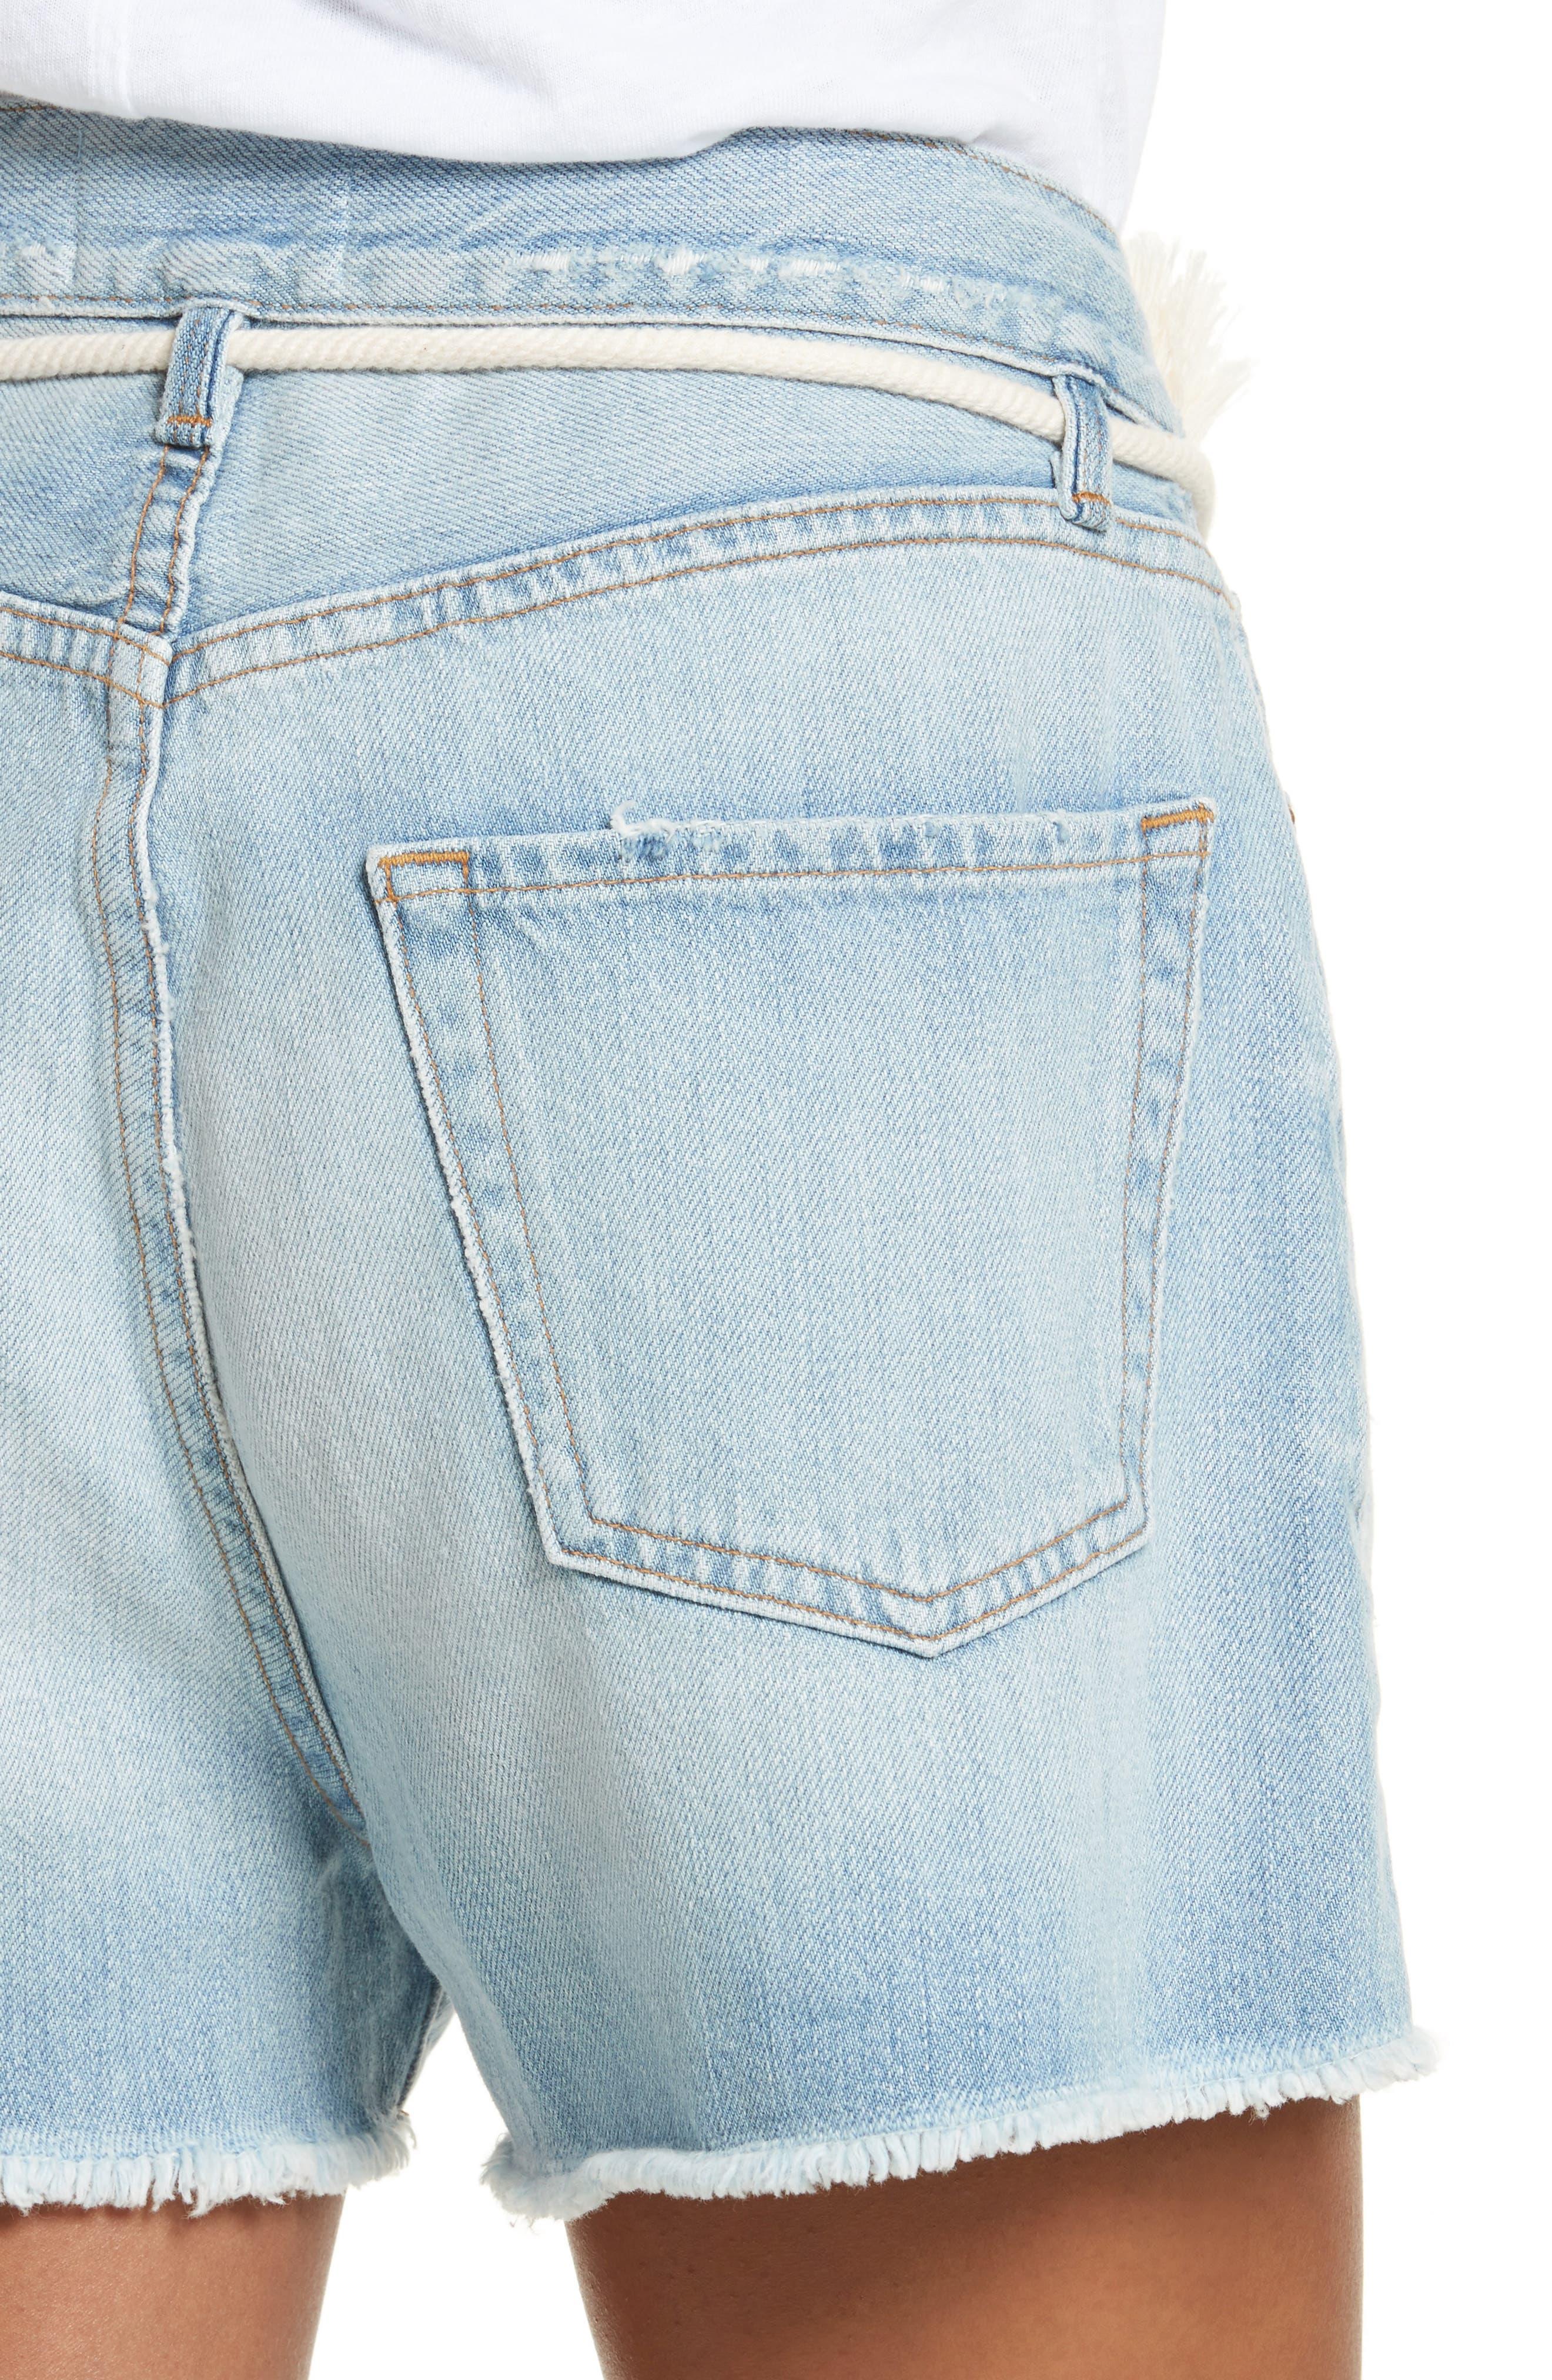 Cutoff Denim Shorts,                             Alternate thumbnail 4, color,                             402